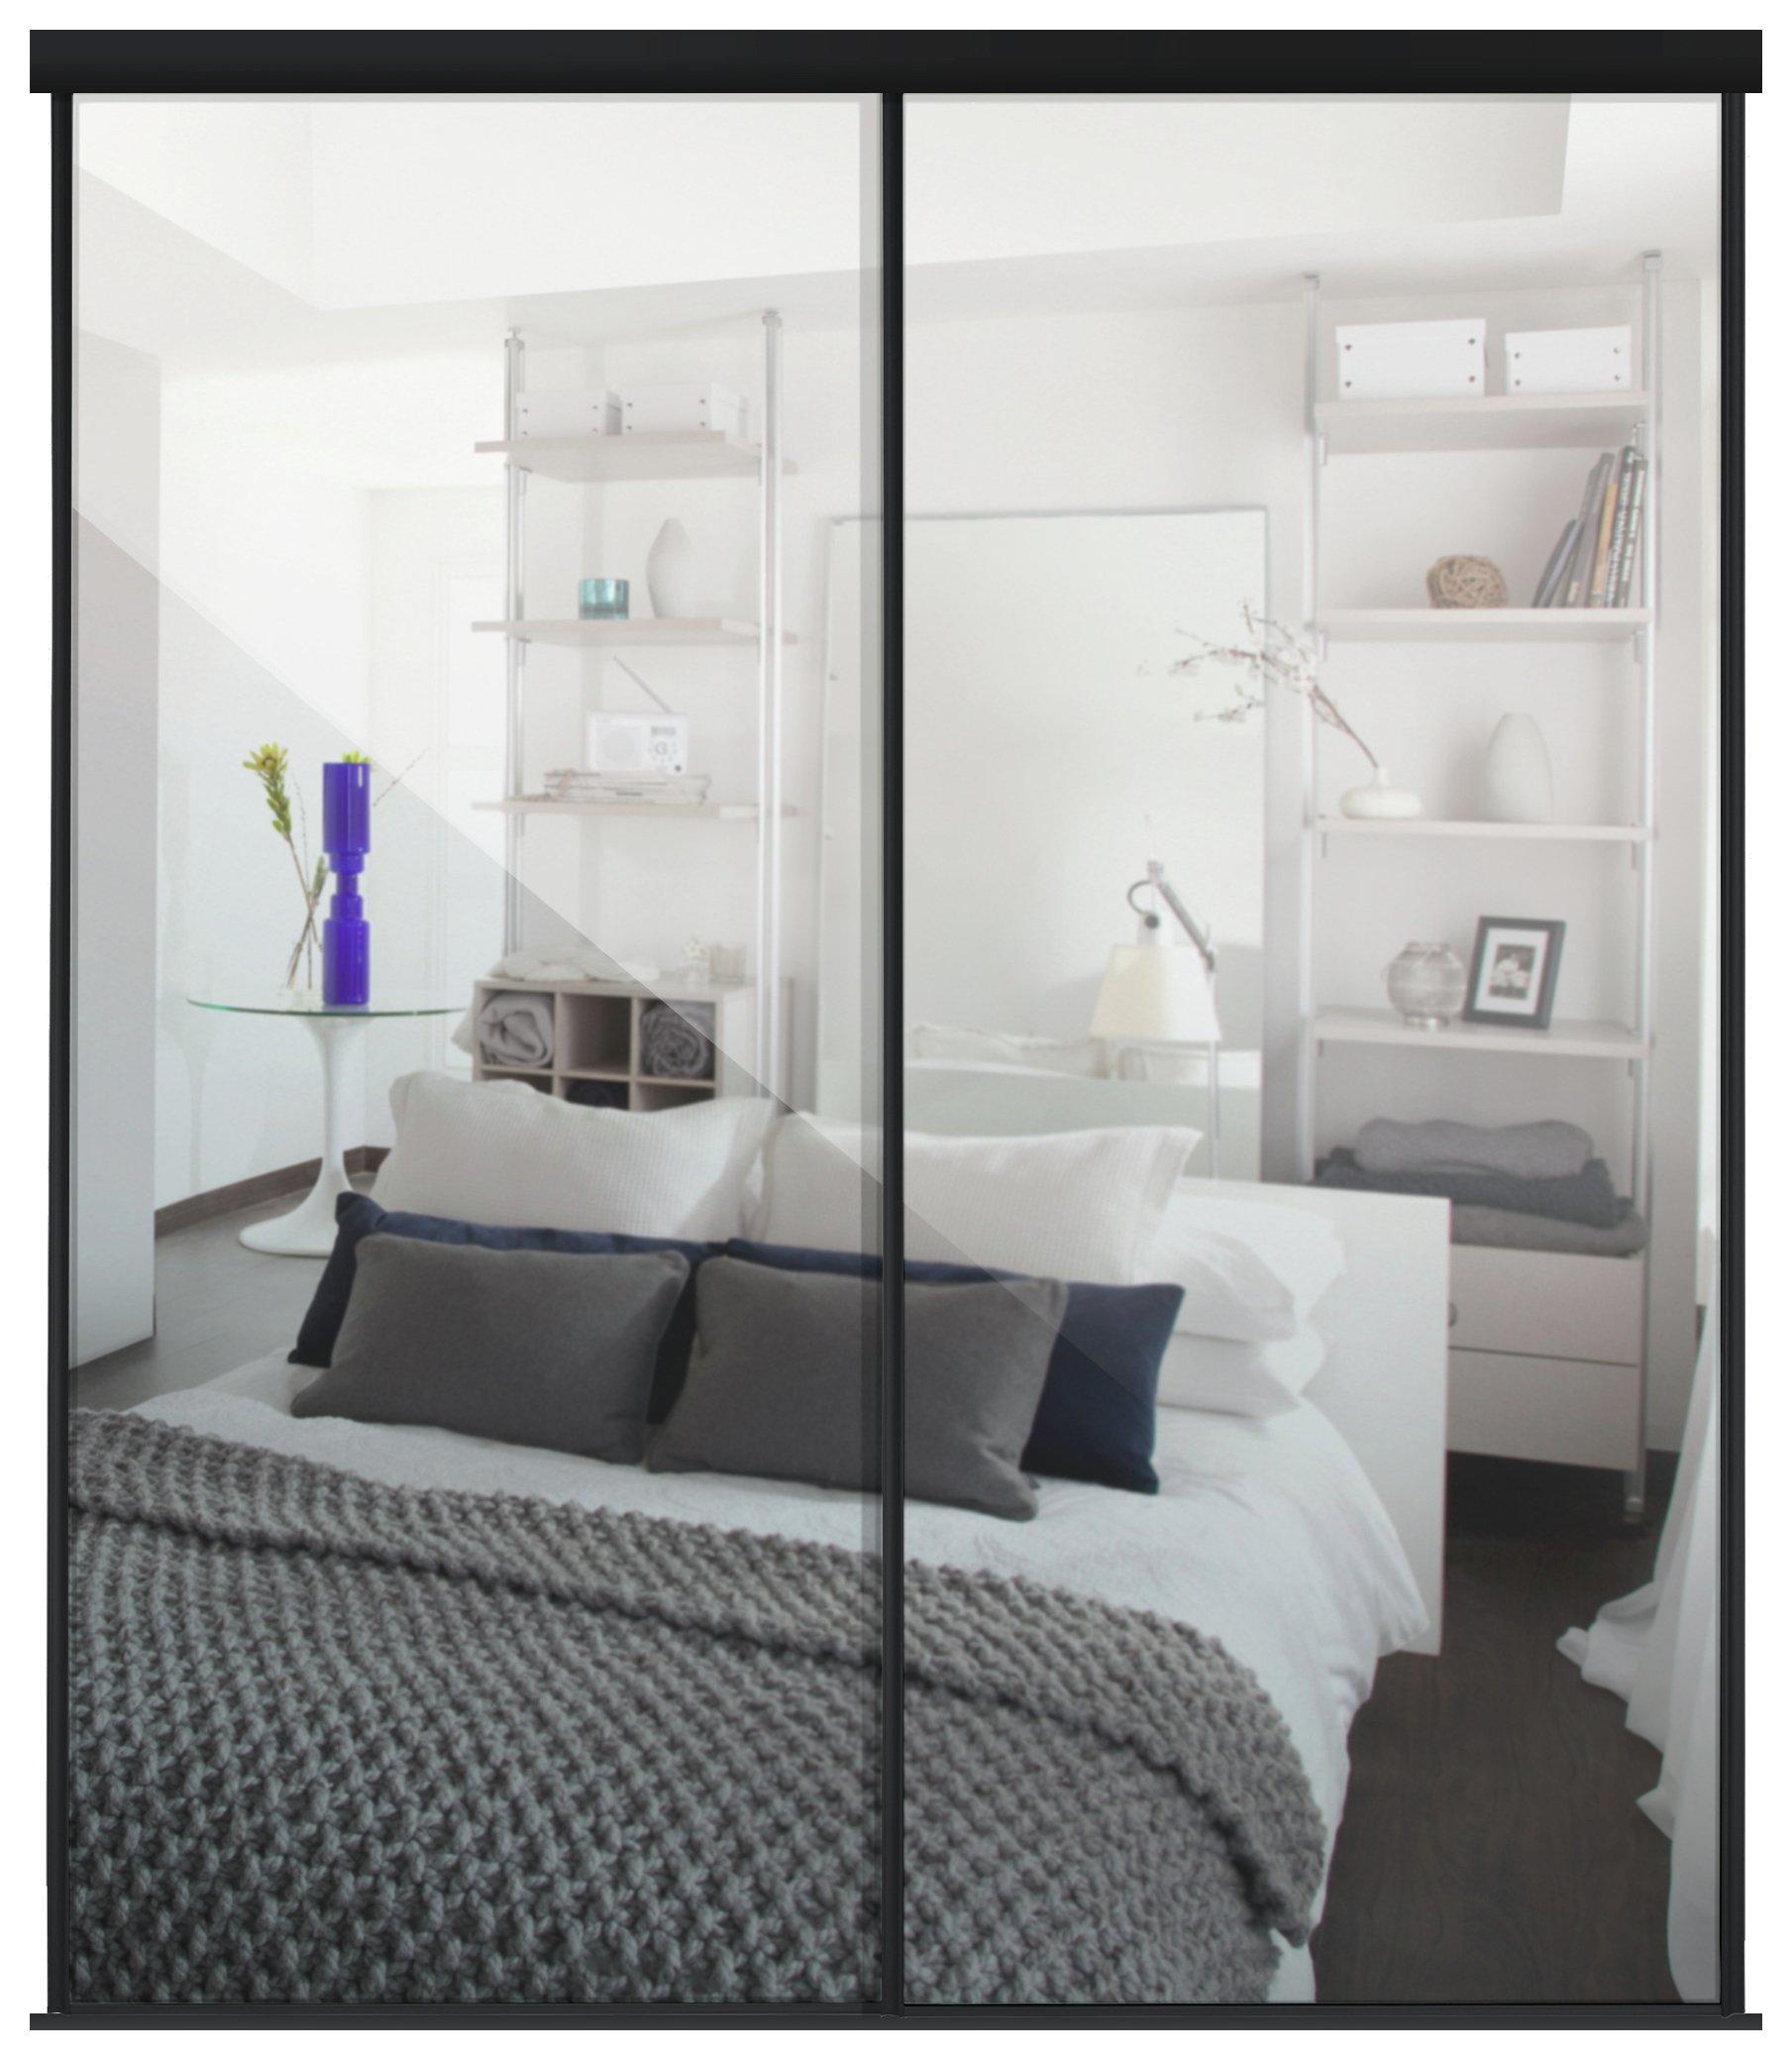 Sliding Wardrobe Door Kit W1498mm Black Frame Mirror. at Argos review